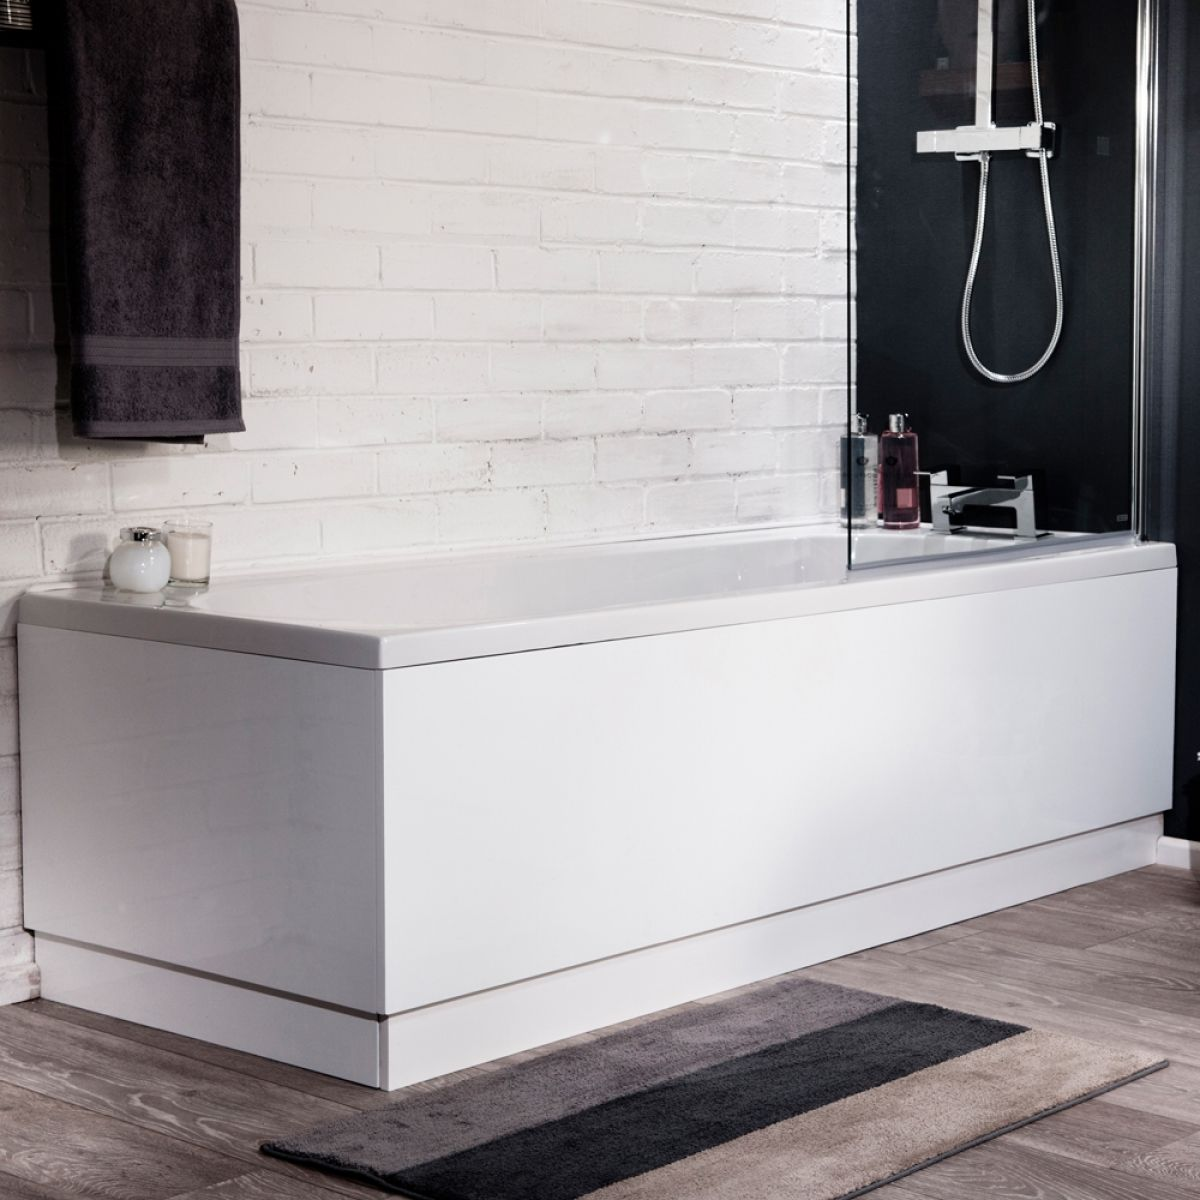 Cassellie High Gloss Adjustable Bath Panel 1700mm